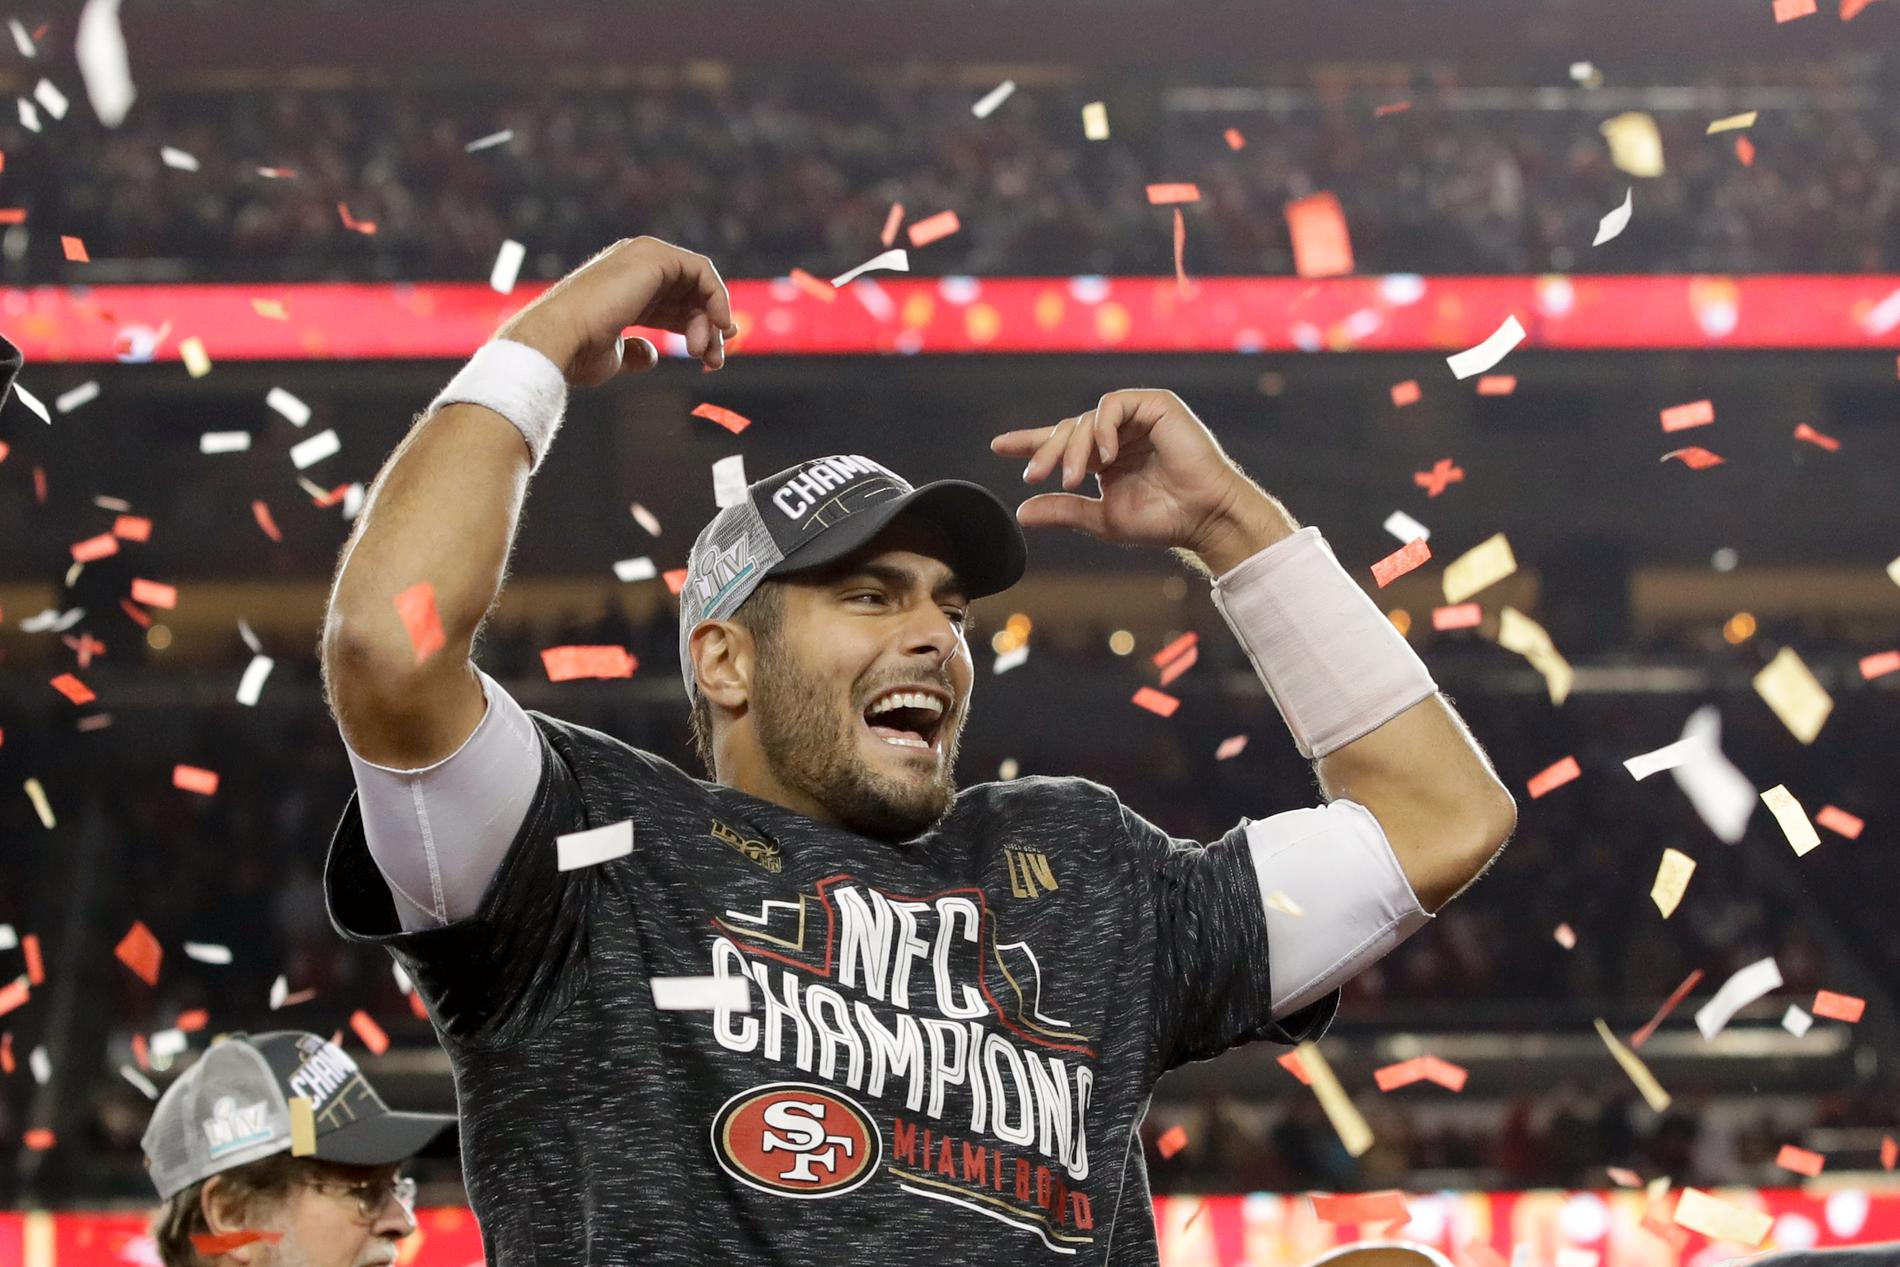 Jimmy Garoppolo, quarterback i San Francisco 49ers, firar efter nattens seger mot Green Bay Packers.